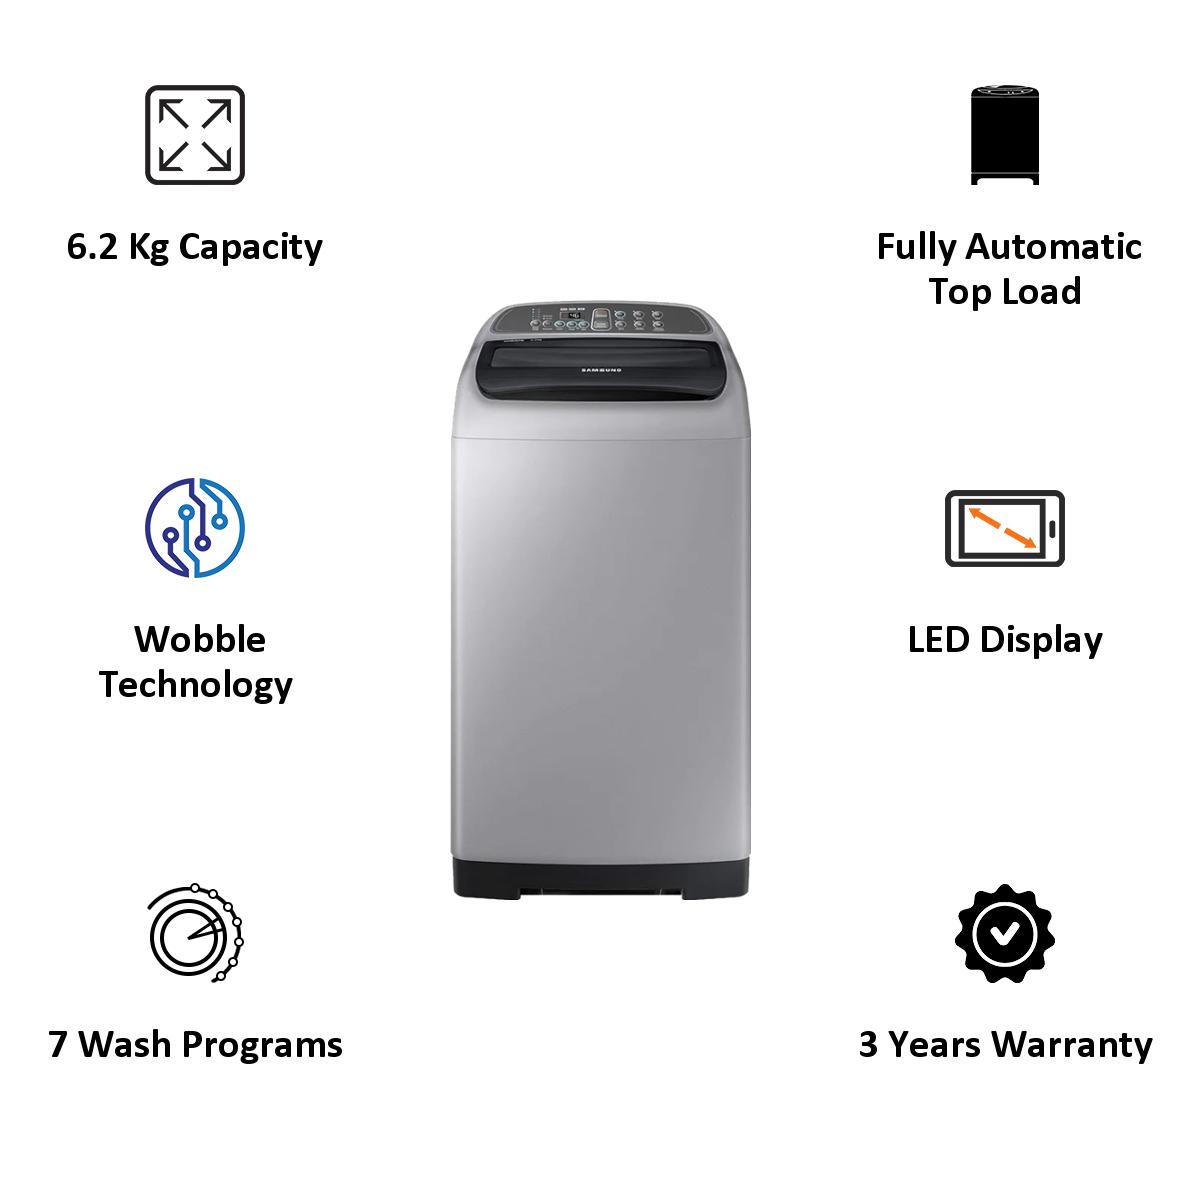 Samsung 6.2 kg Fully Automatic Top Loading Washing Machine (WA62M4200HA/TL, Silver) 5